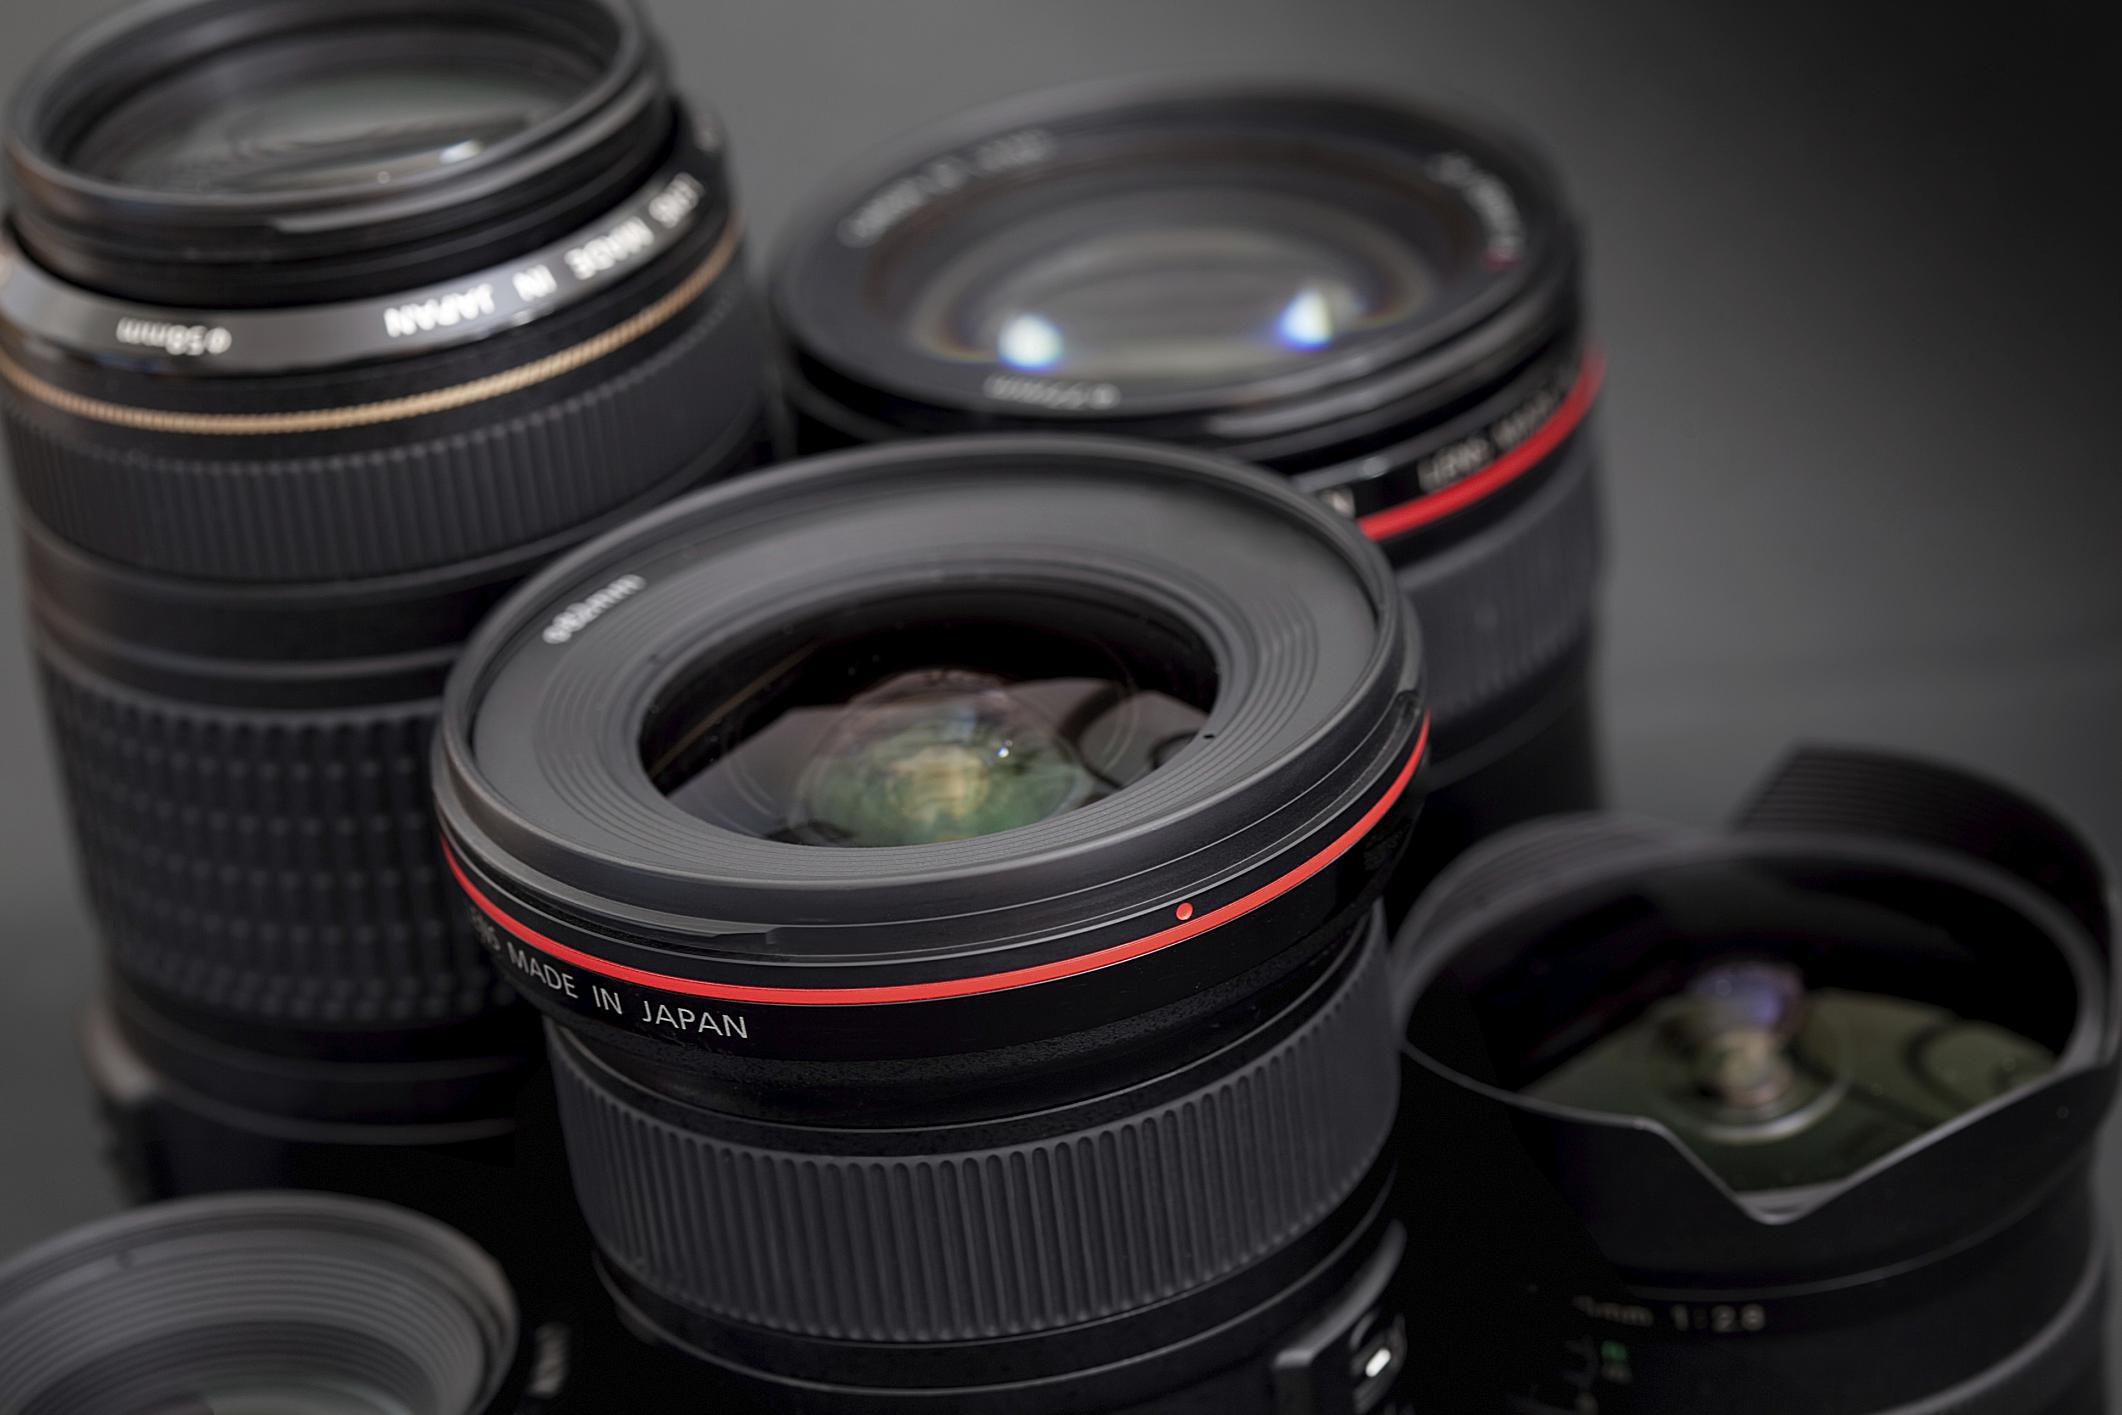 lens basics understanding camera lenses - HD2122×1415